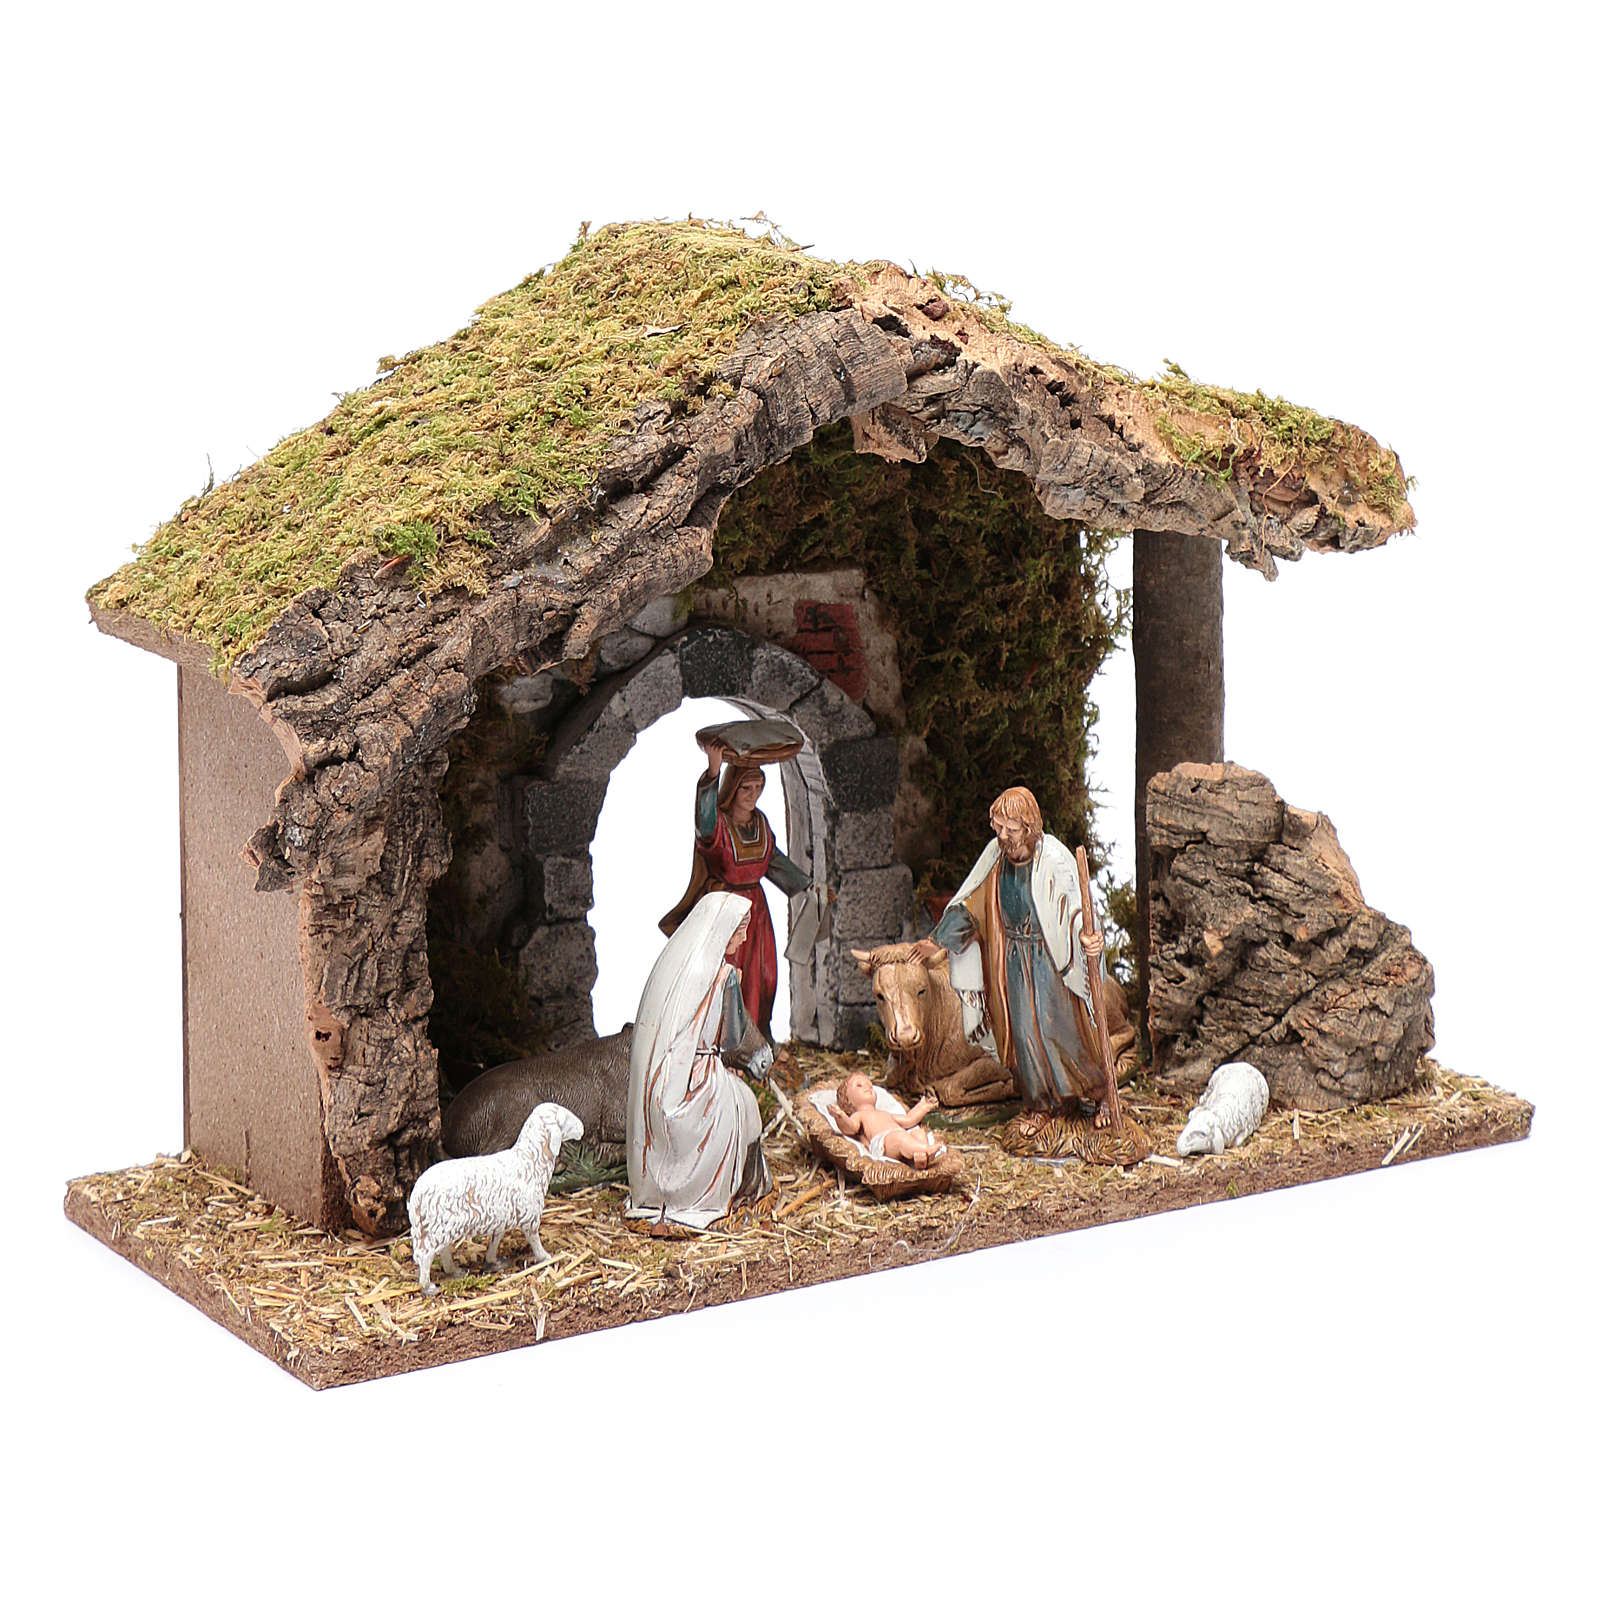 Hut with gypsum arch 25x35x15 cm 4